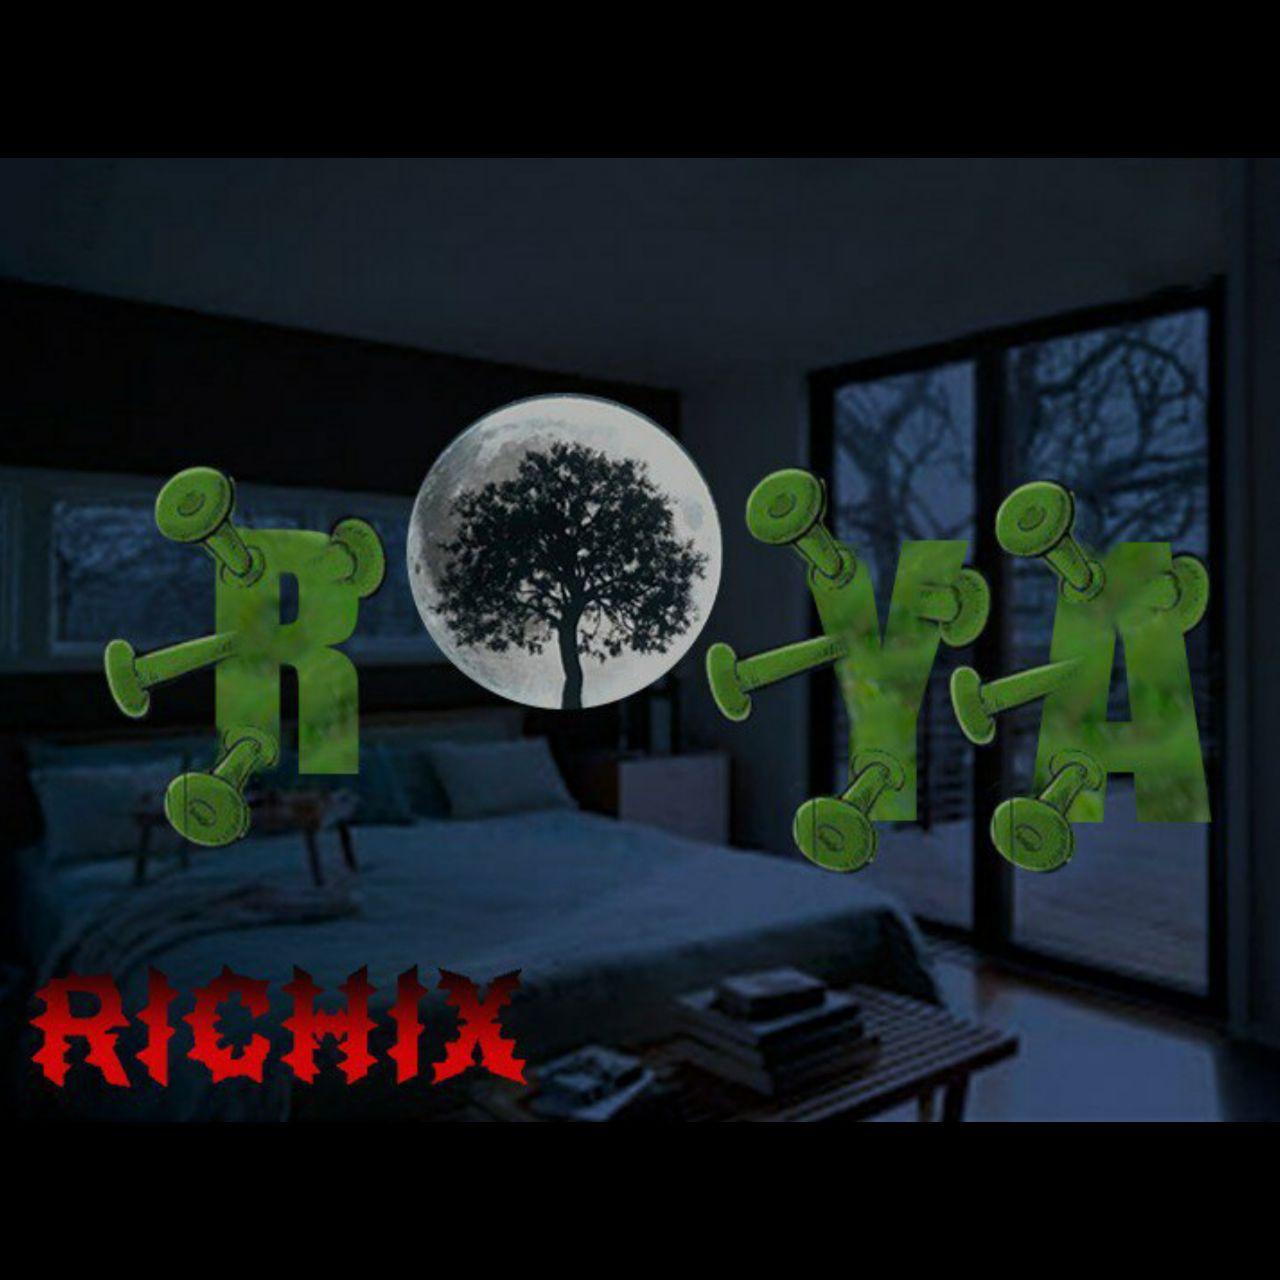 Richix – Roya